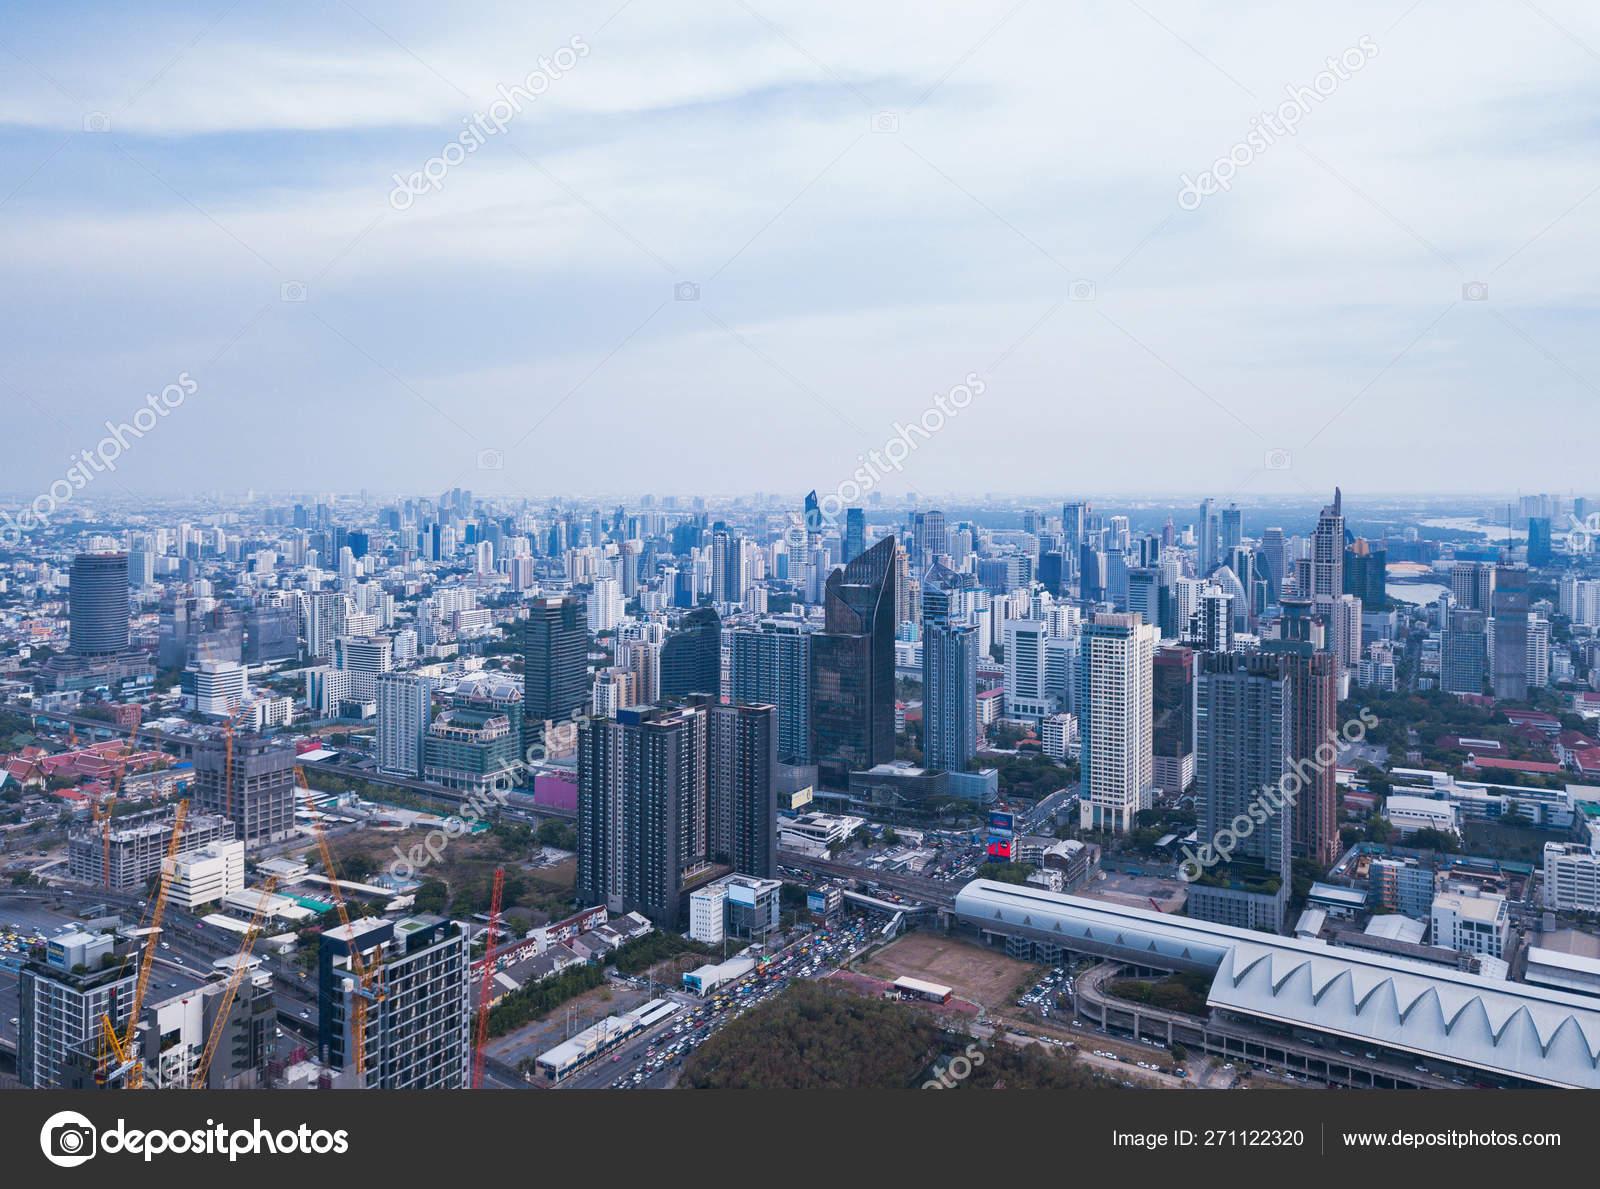 Aerial view of Rama 9 road, New CBD, Bangkok Downtown